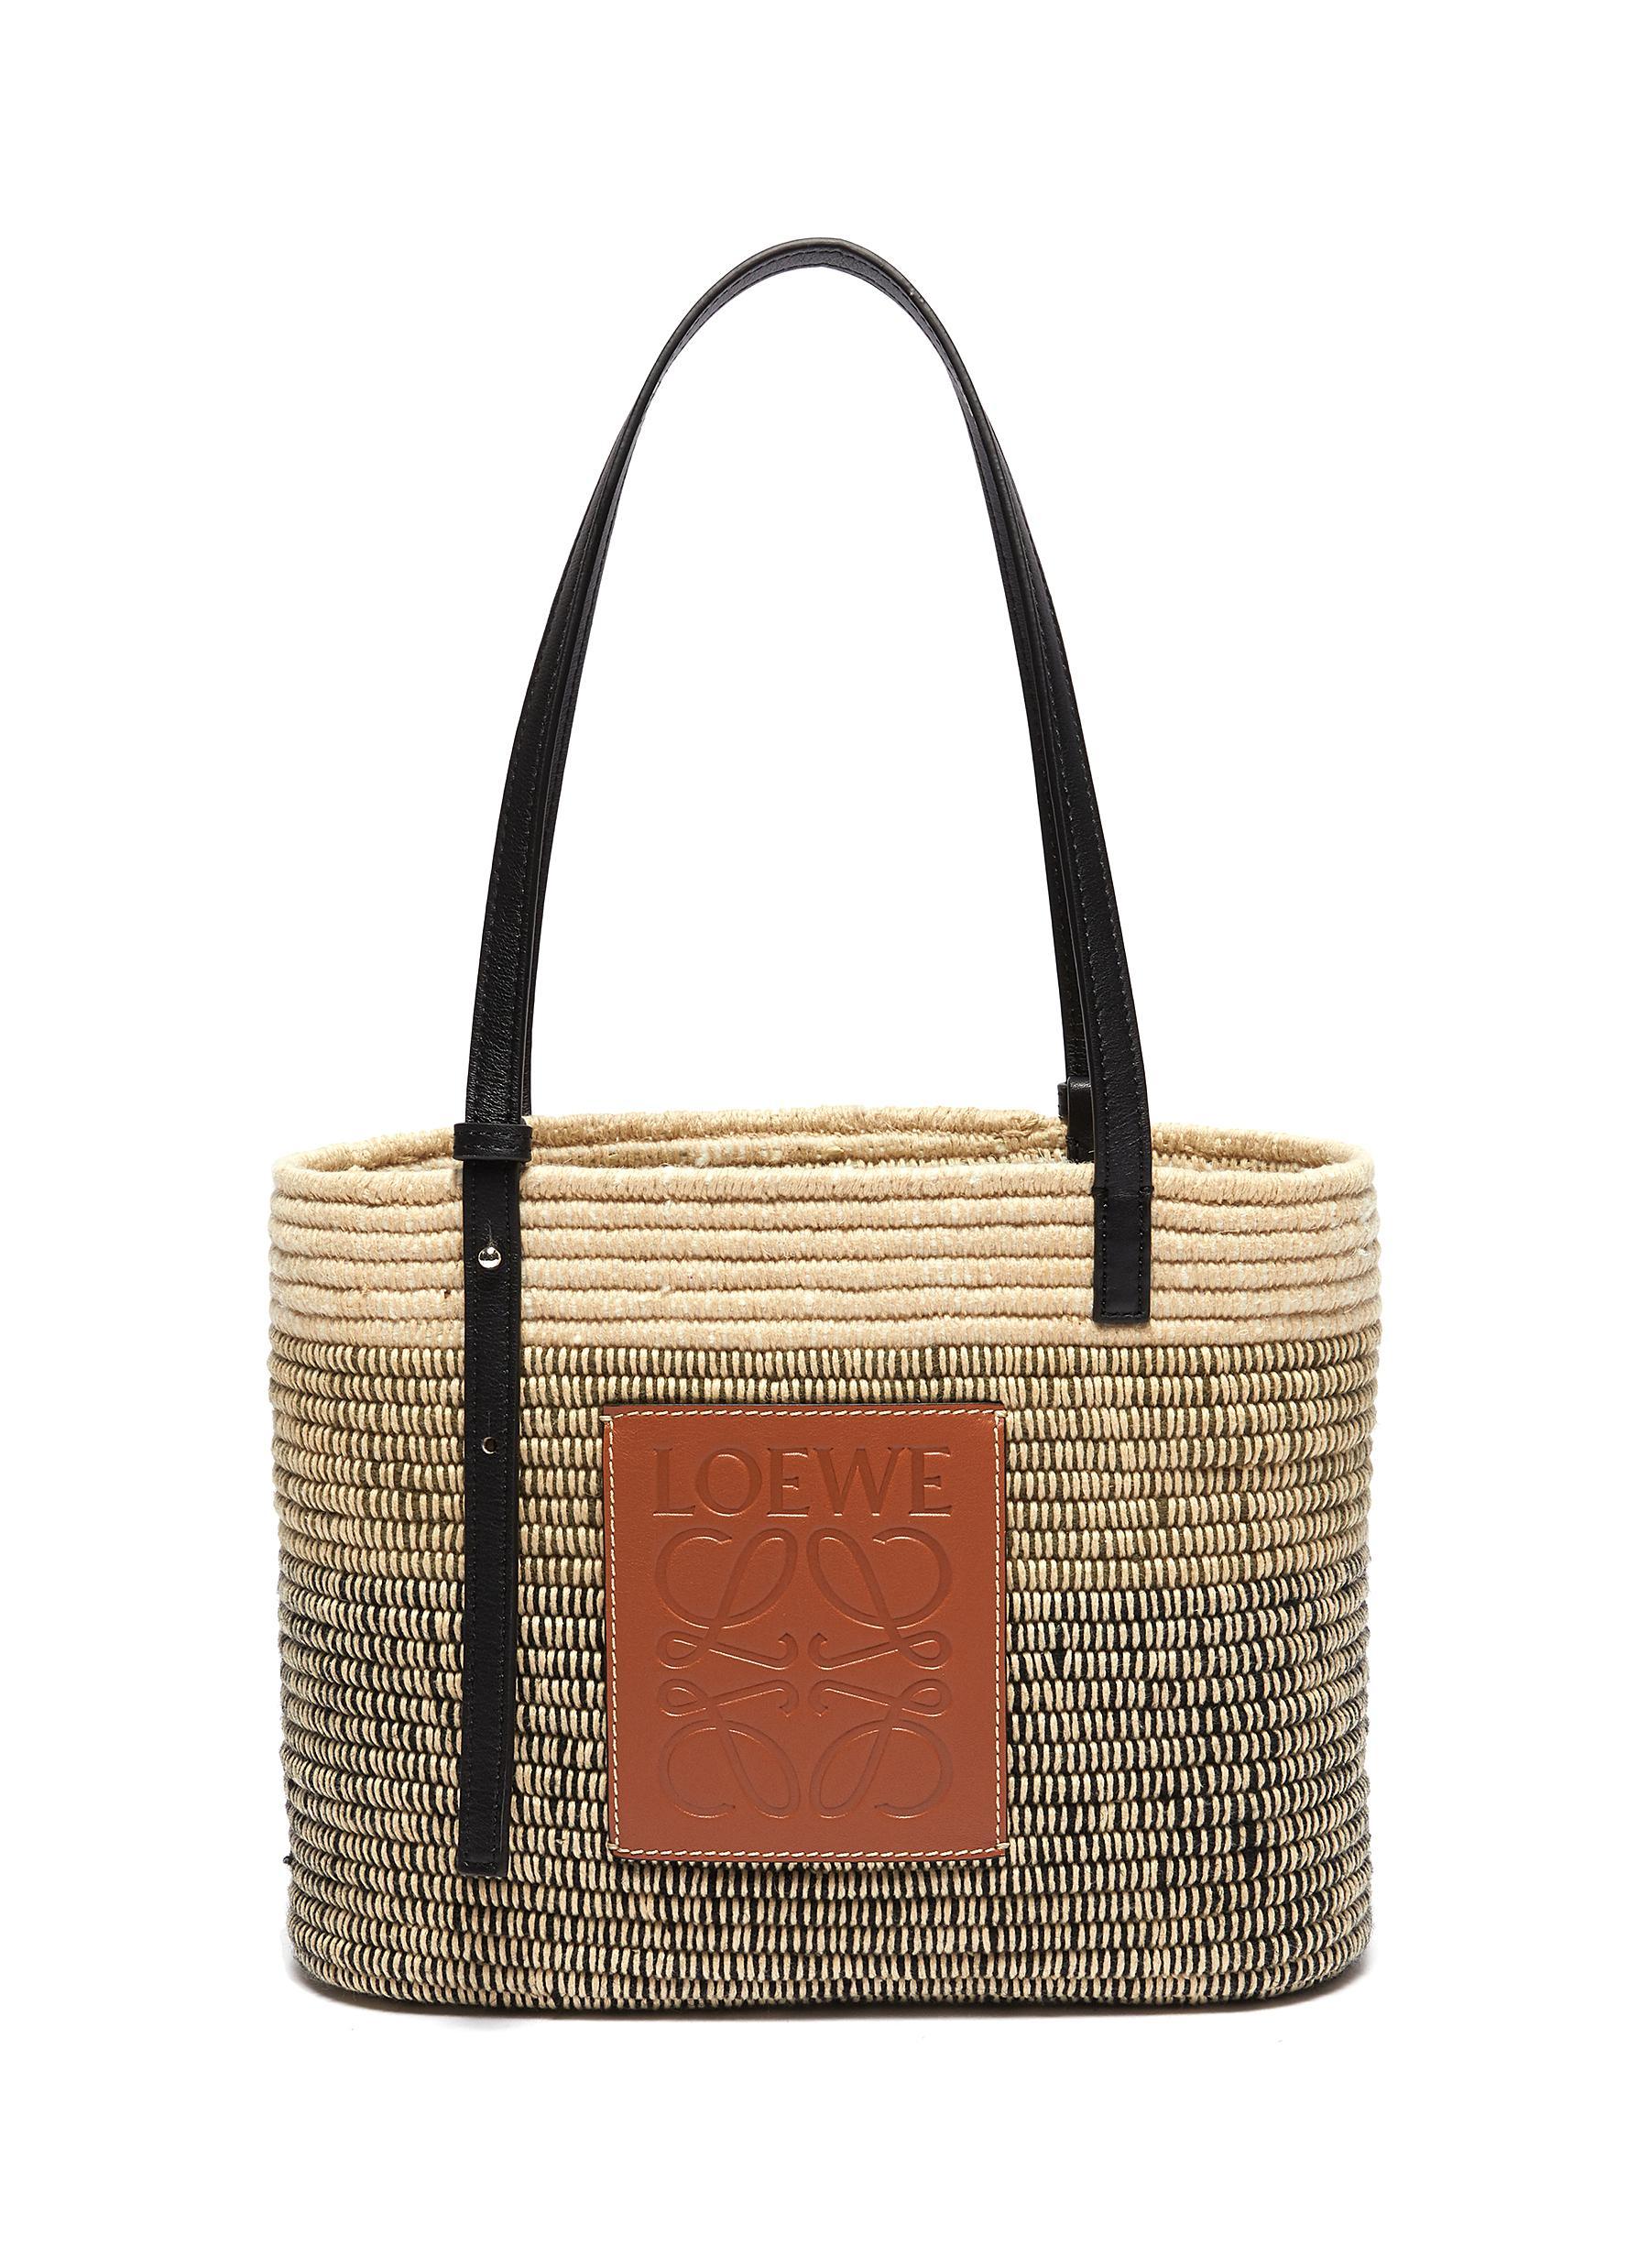 Loewe 'SQUARE' SMALL BASKET BAG